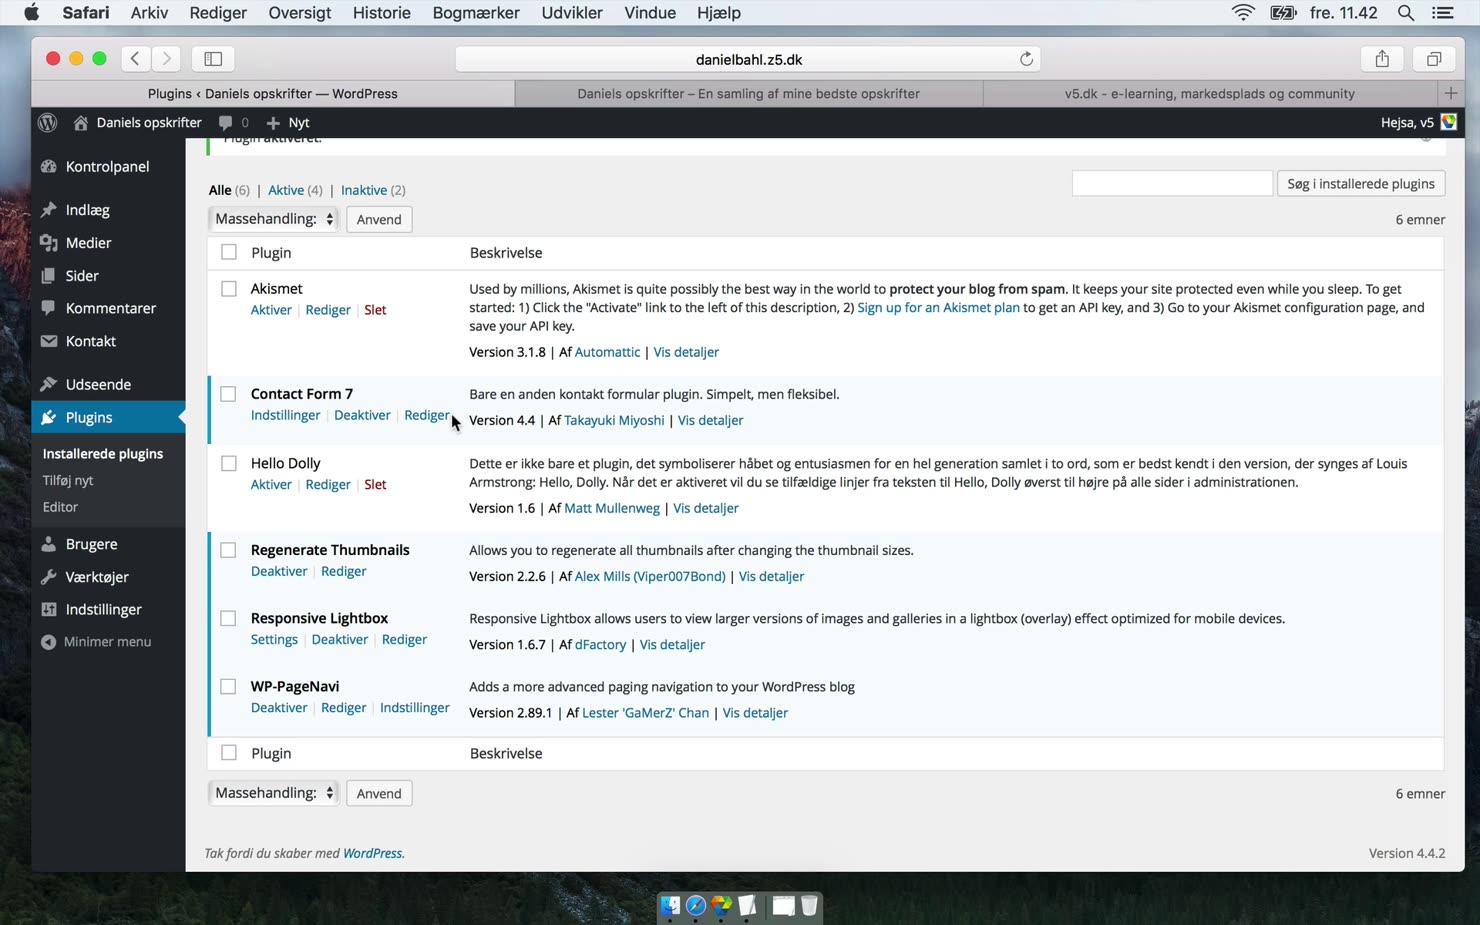 Dine første plugins i WordPress